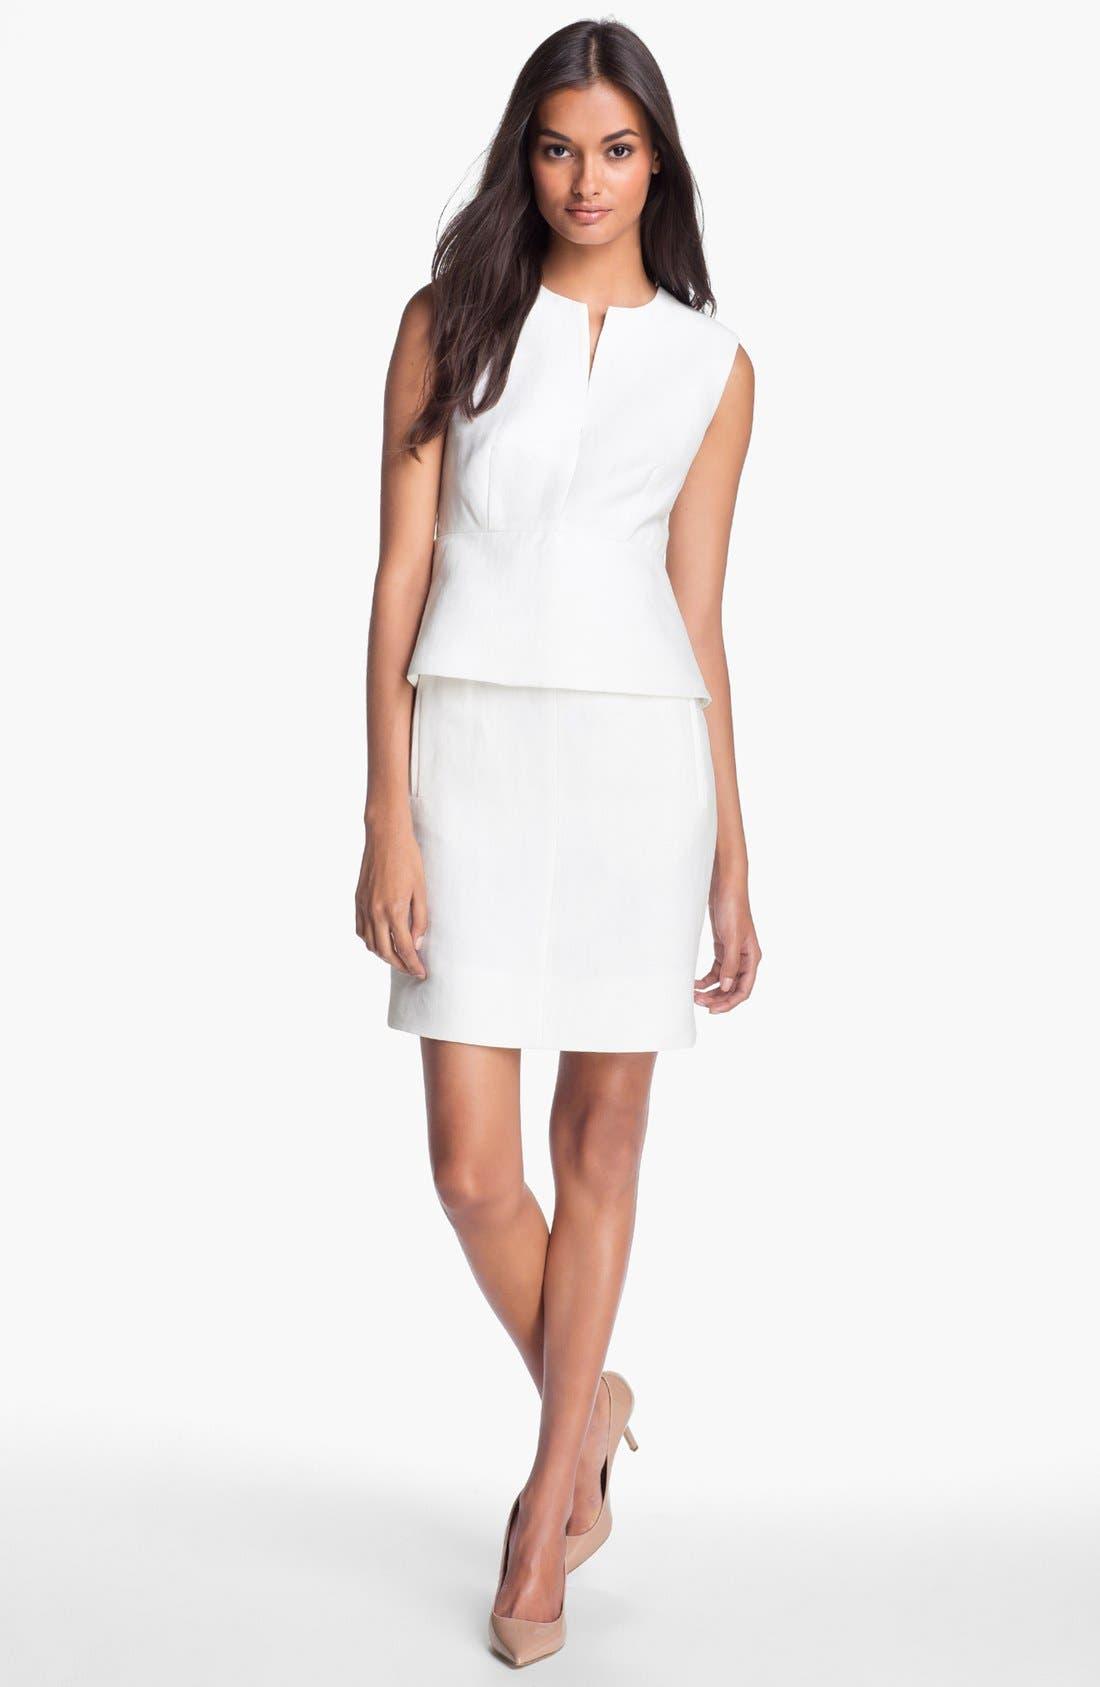 Alternate Image 1 Selected - Diane von Furstenberg 'Delian' Linen Blend Sheath Dress